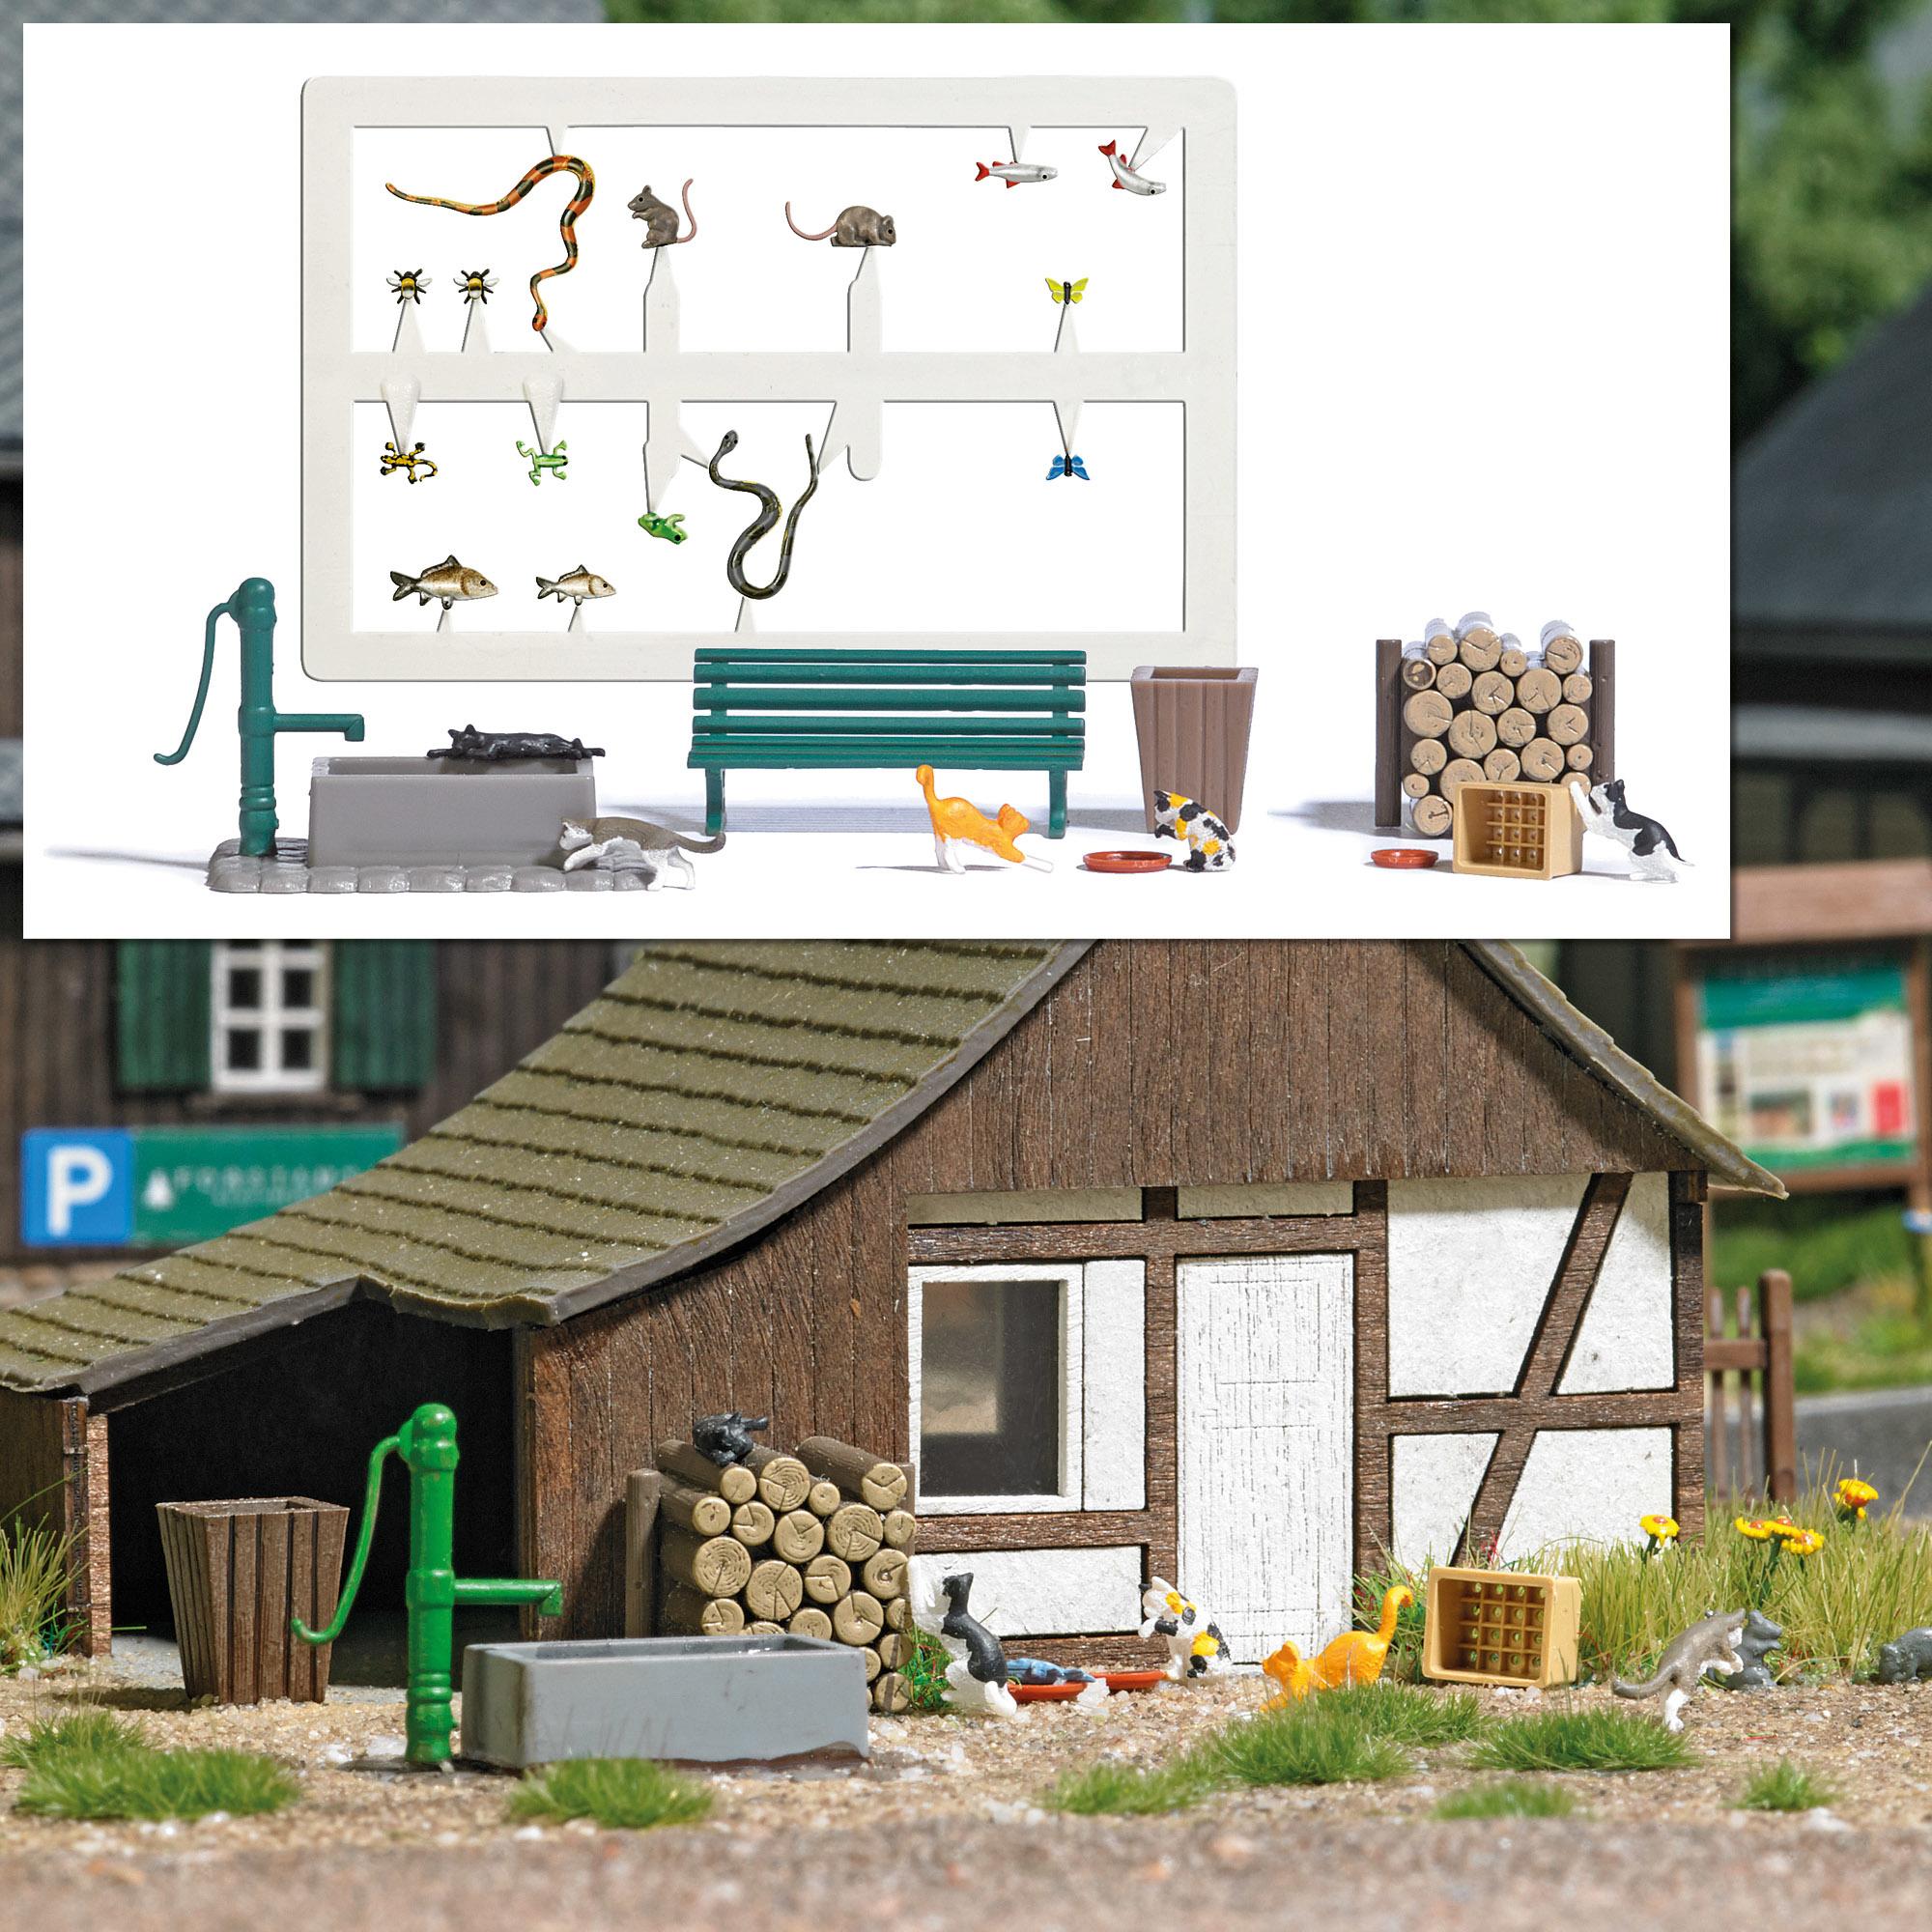 Busch 7921 Spoor H0 A-Set: Spielende Katzen, H0-1